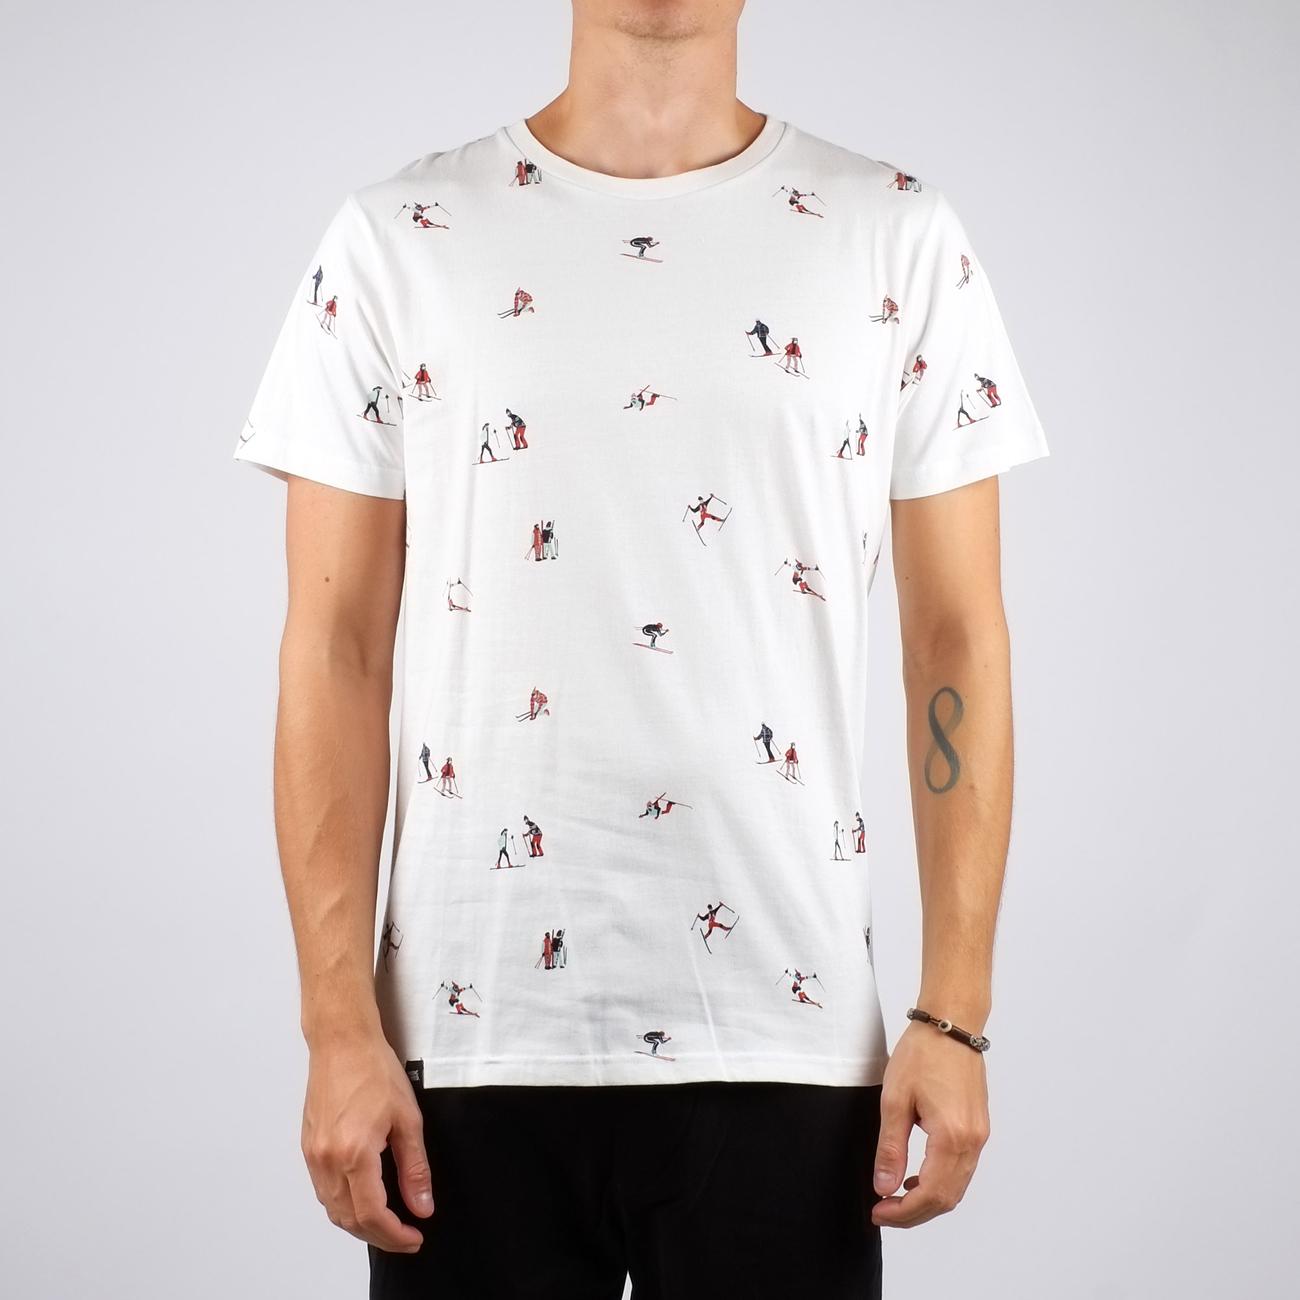 Stockholm T-shirt Ski People